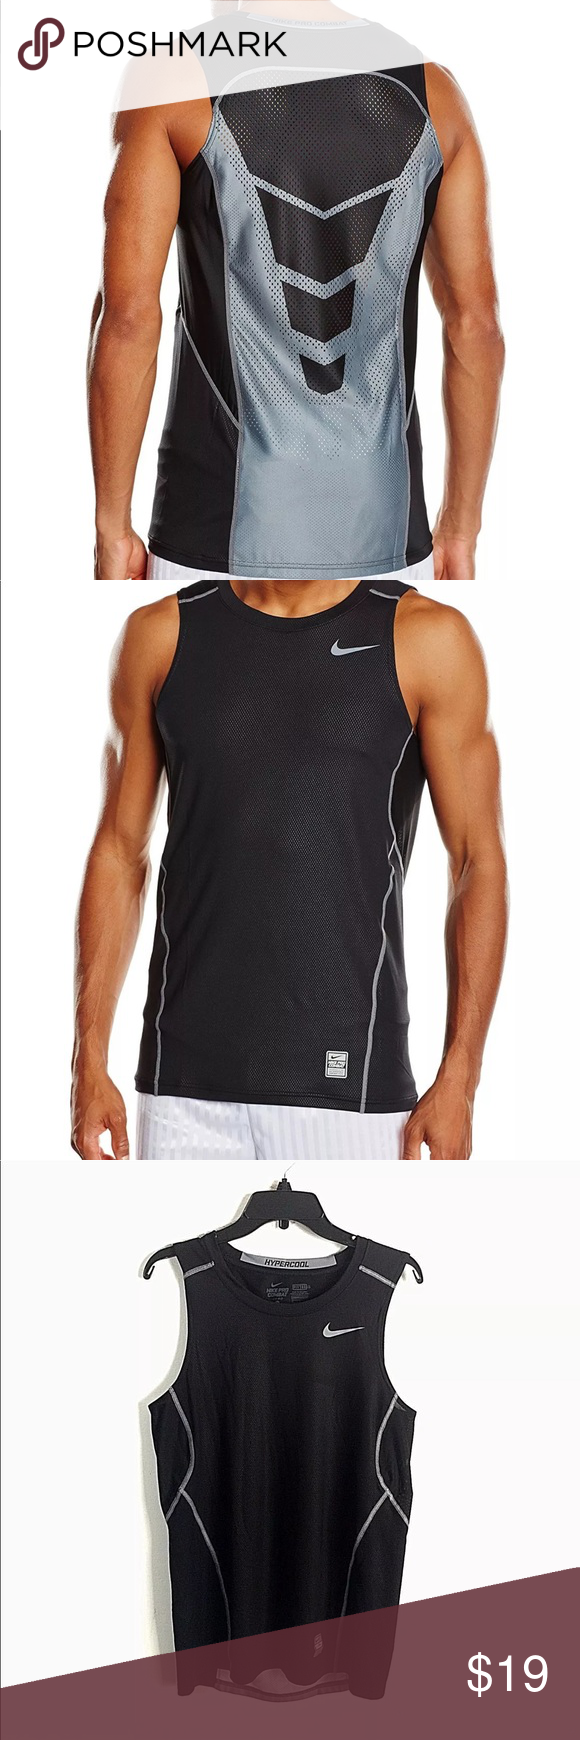 ab22eb7d1e1a4 Nike Hypercool Sleeveless Compression Shirt - BCD Tofu House